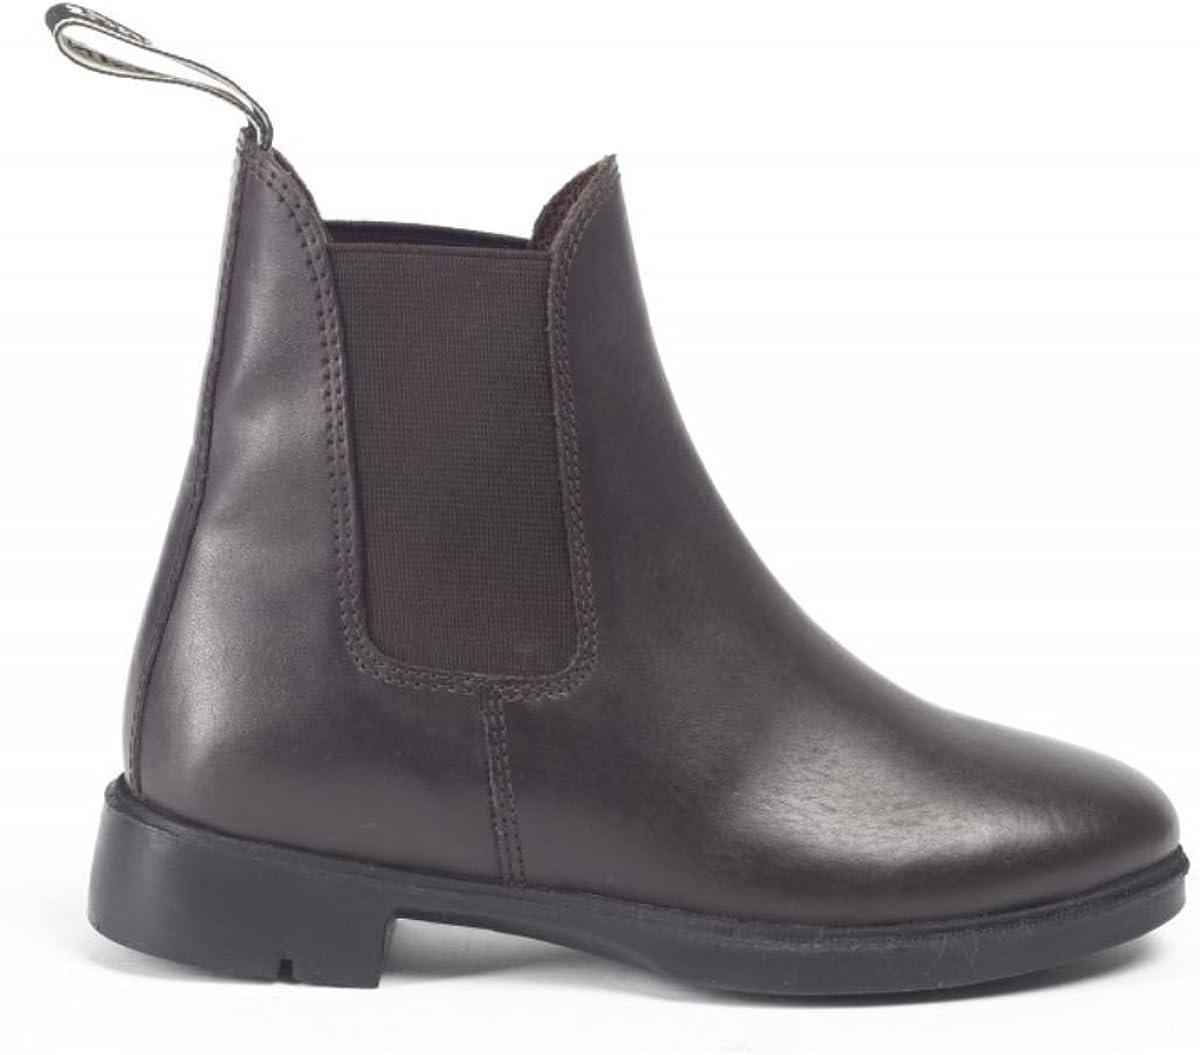 Brogini Childrens/Kids Pavia Piccino Leather Paddock Boots